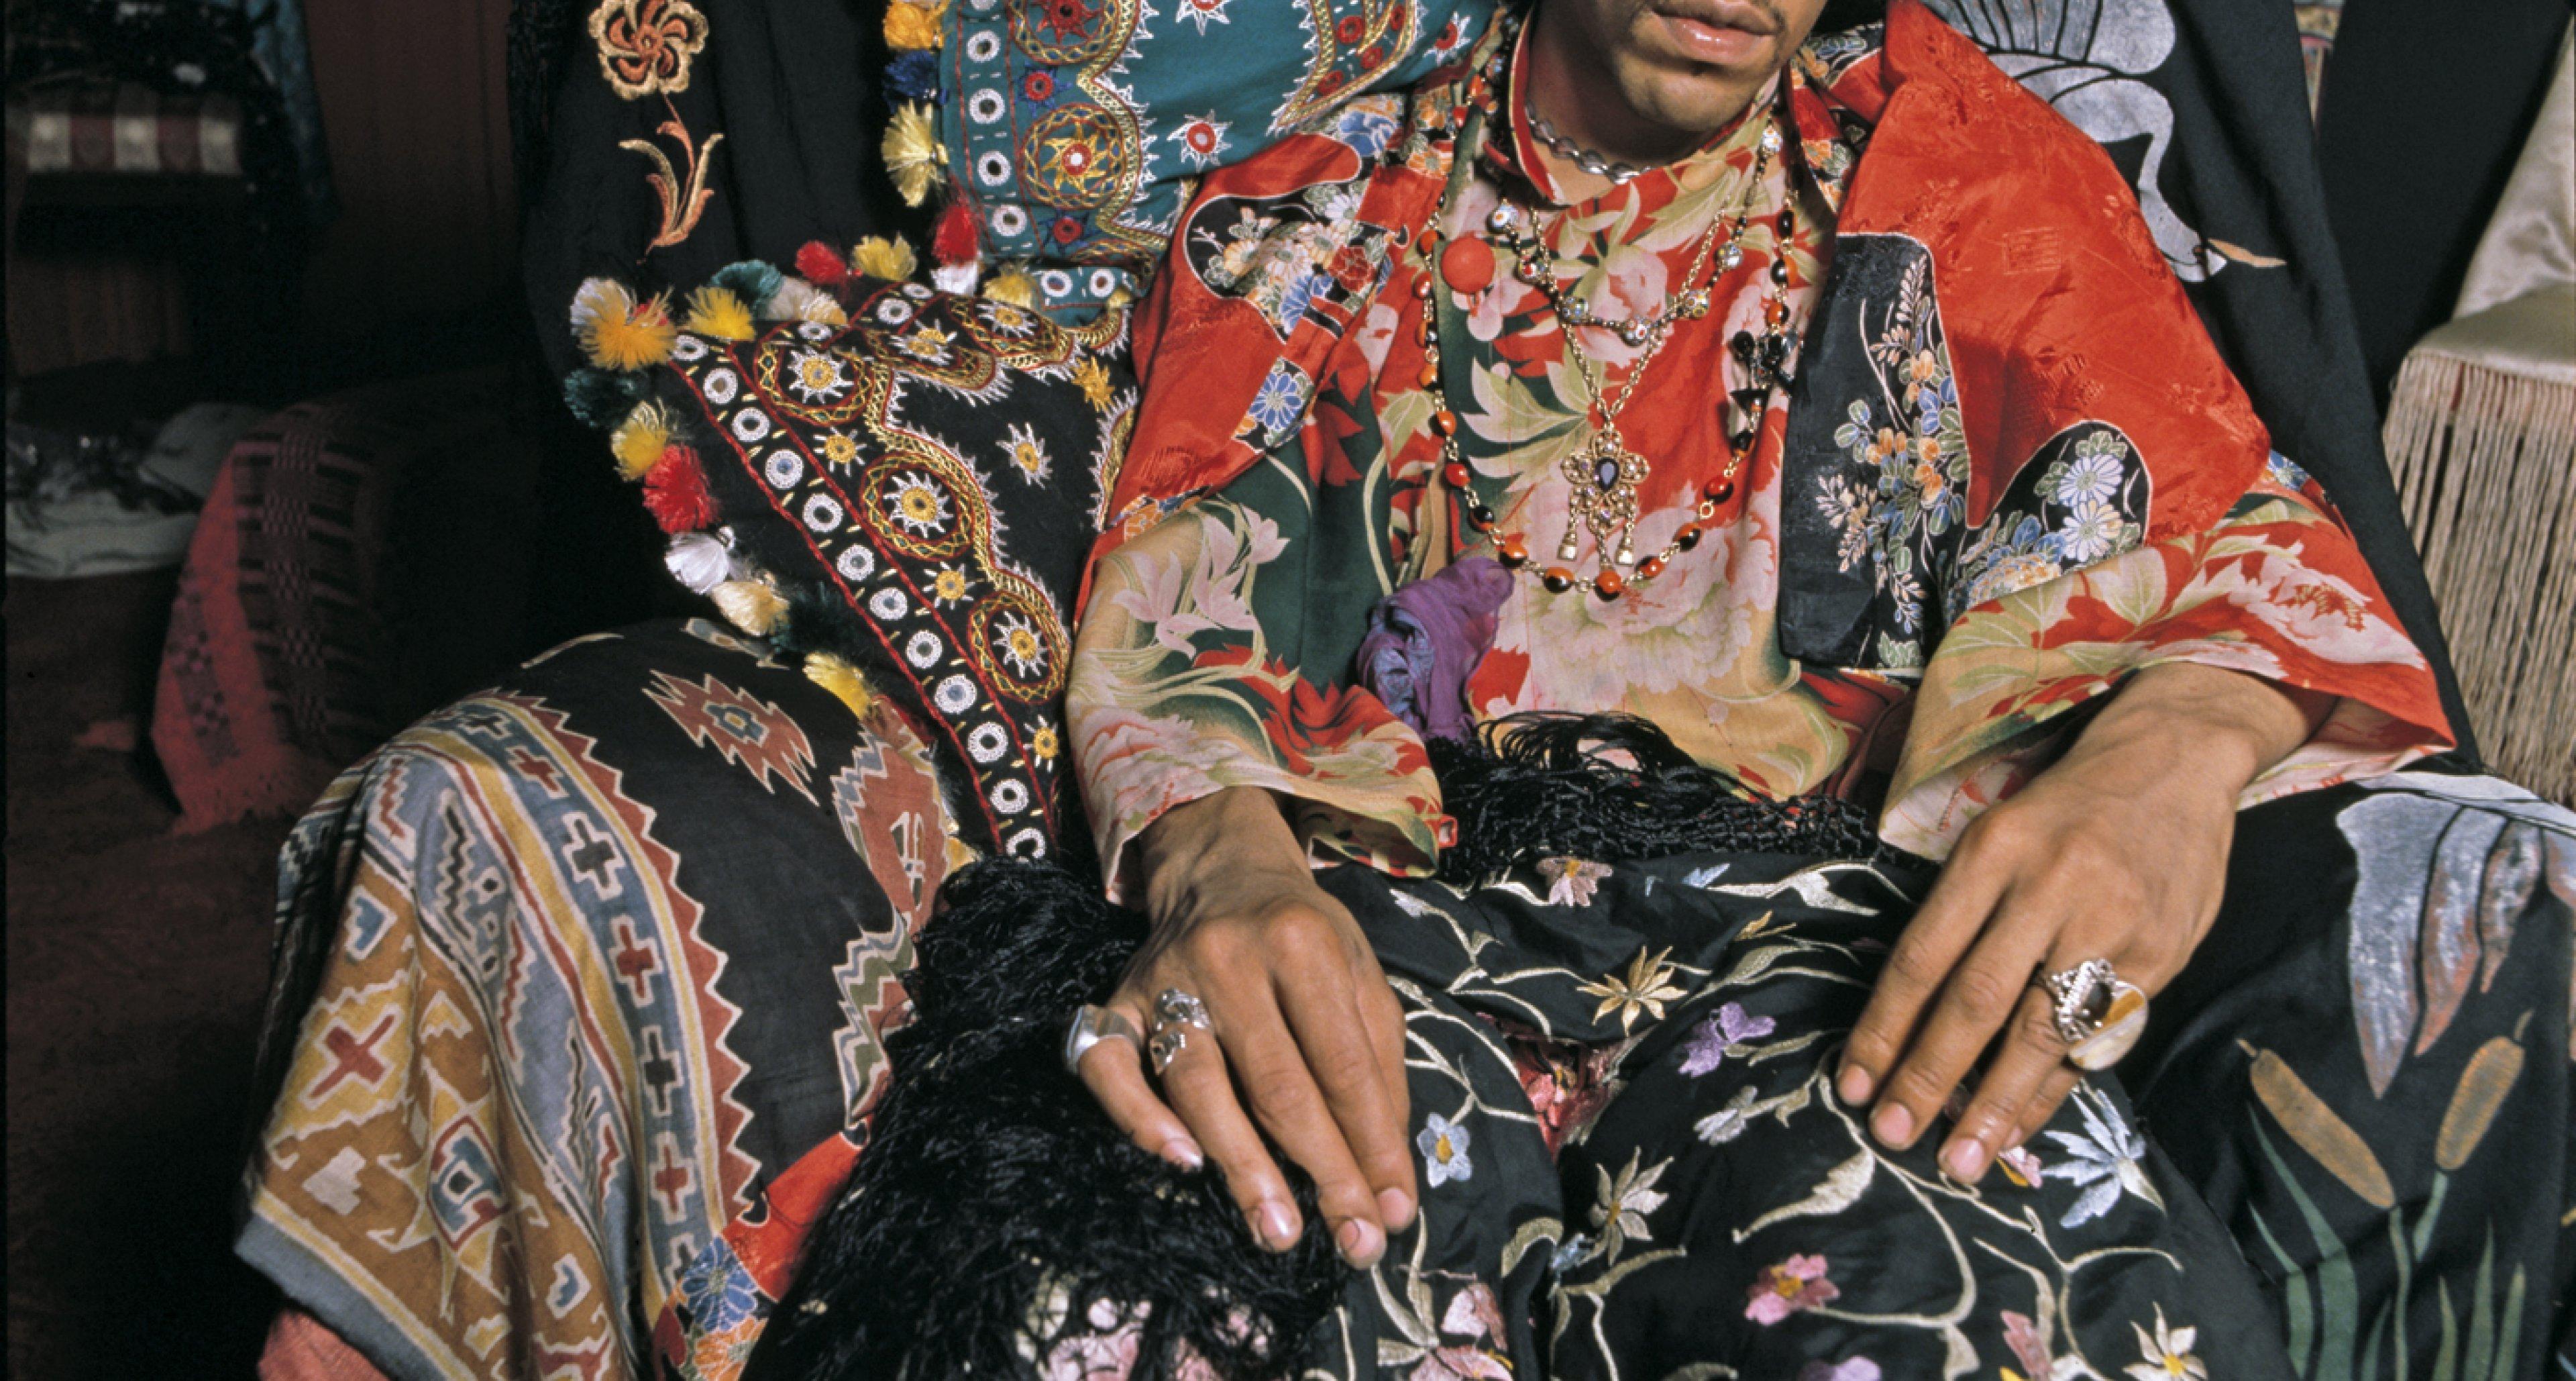 Jimi Hendrix - Photo by Terence Donovan/Getty Images. Original Man, Copyright Gestalten 2014